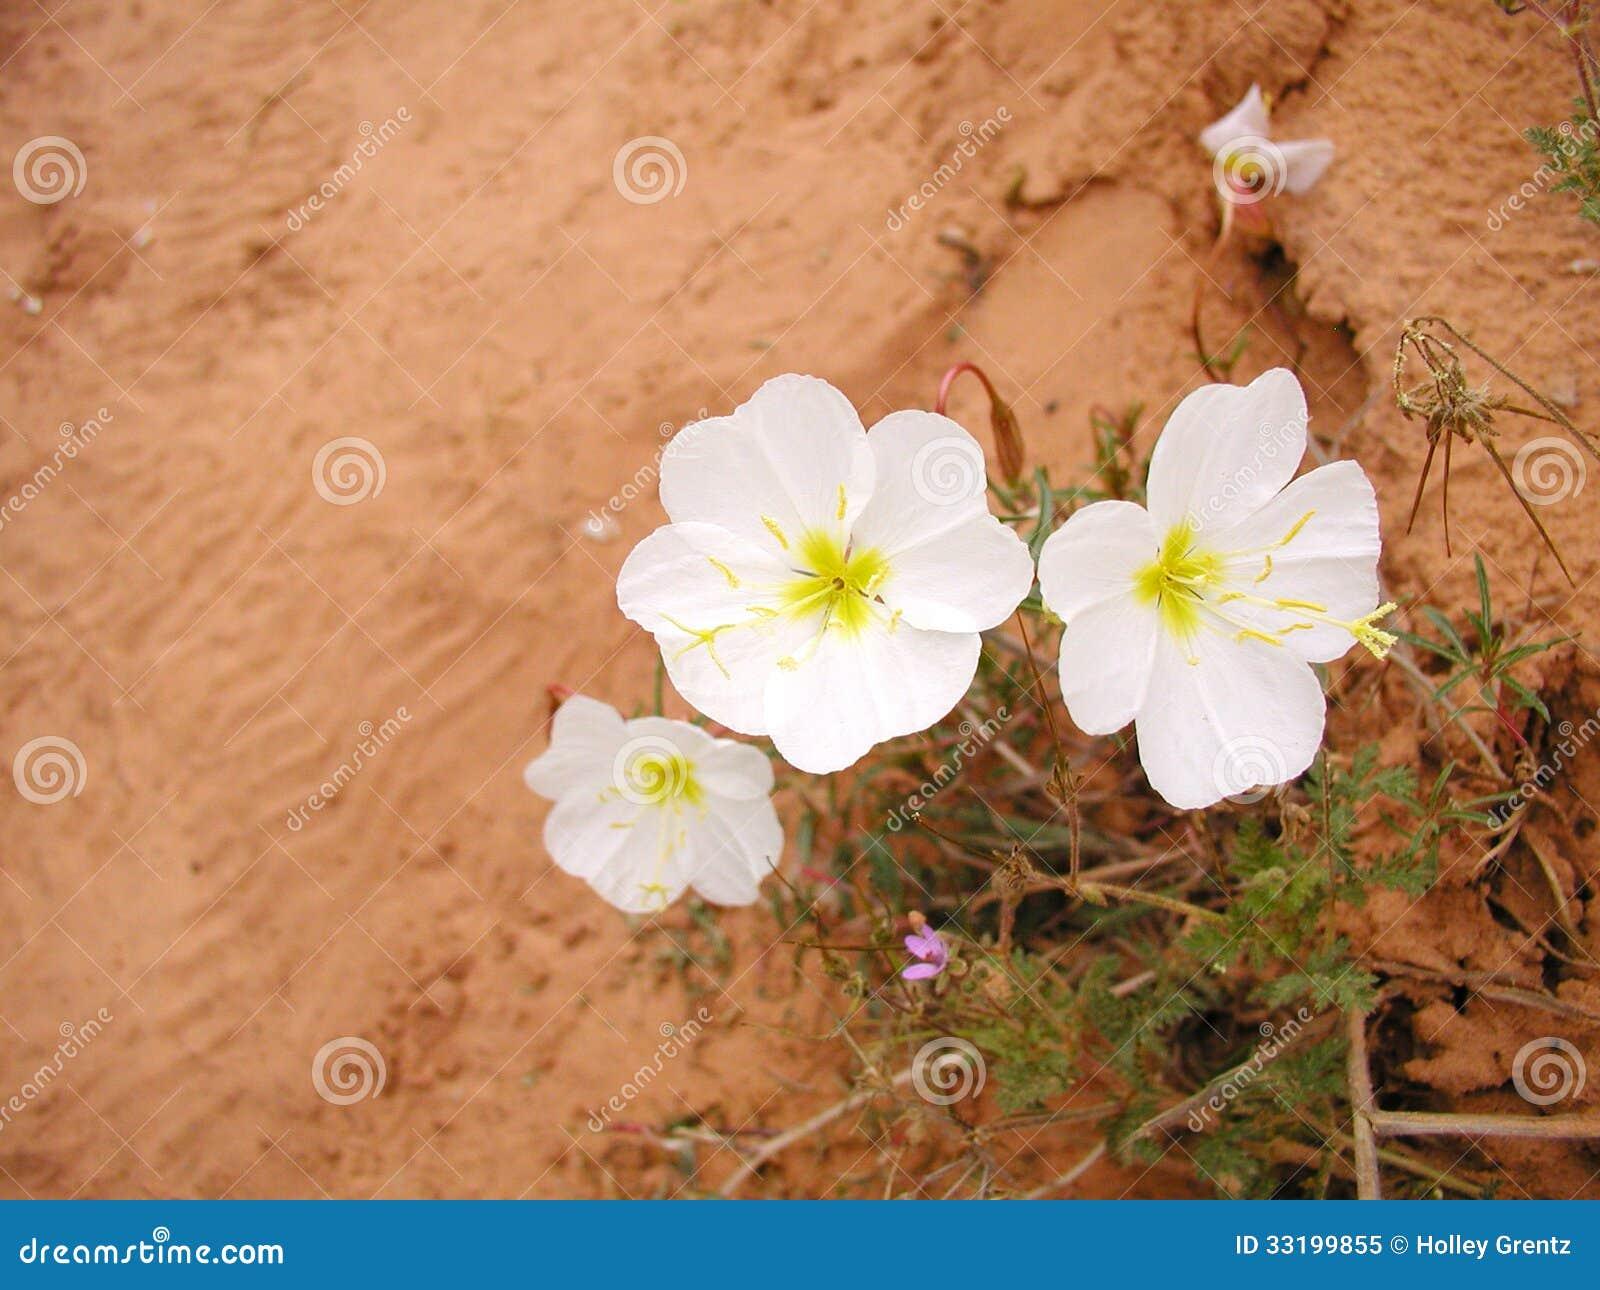 White Desert Flowers Stock Image Image Of Arid Nature 33199855